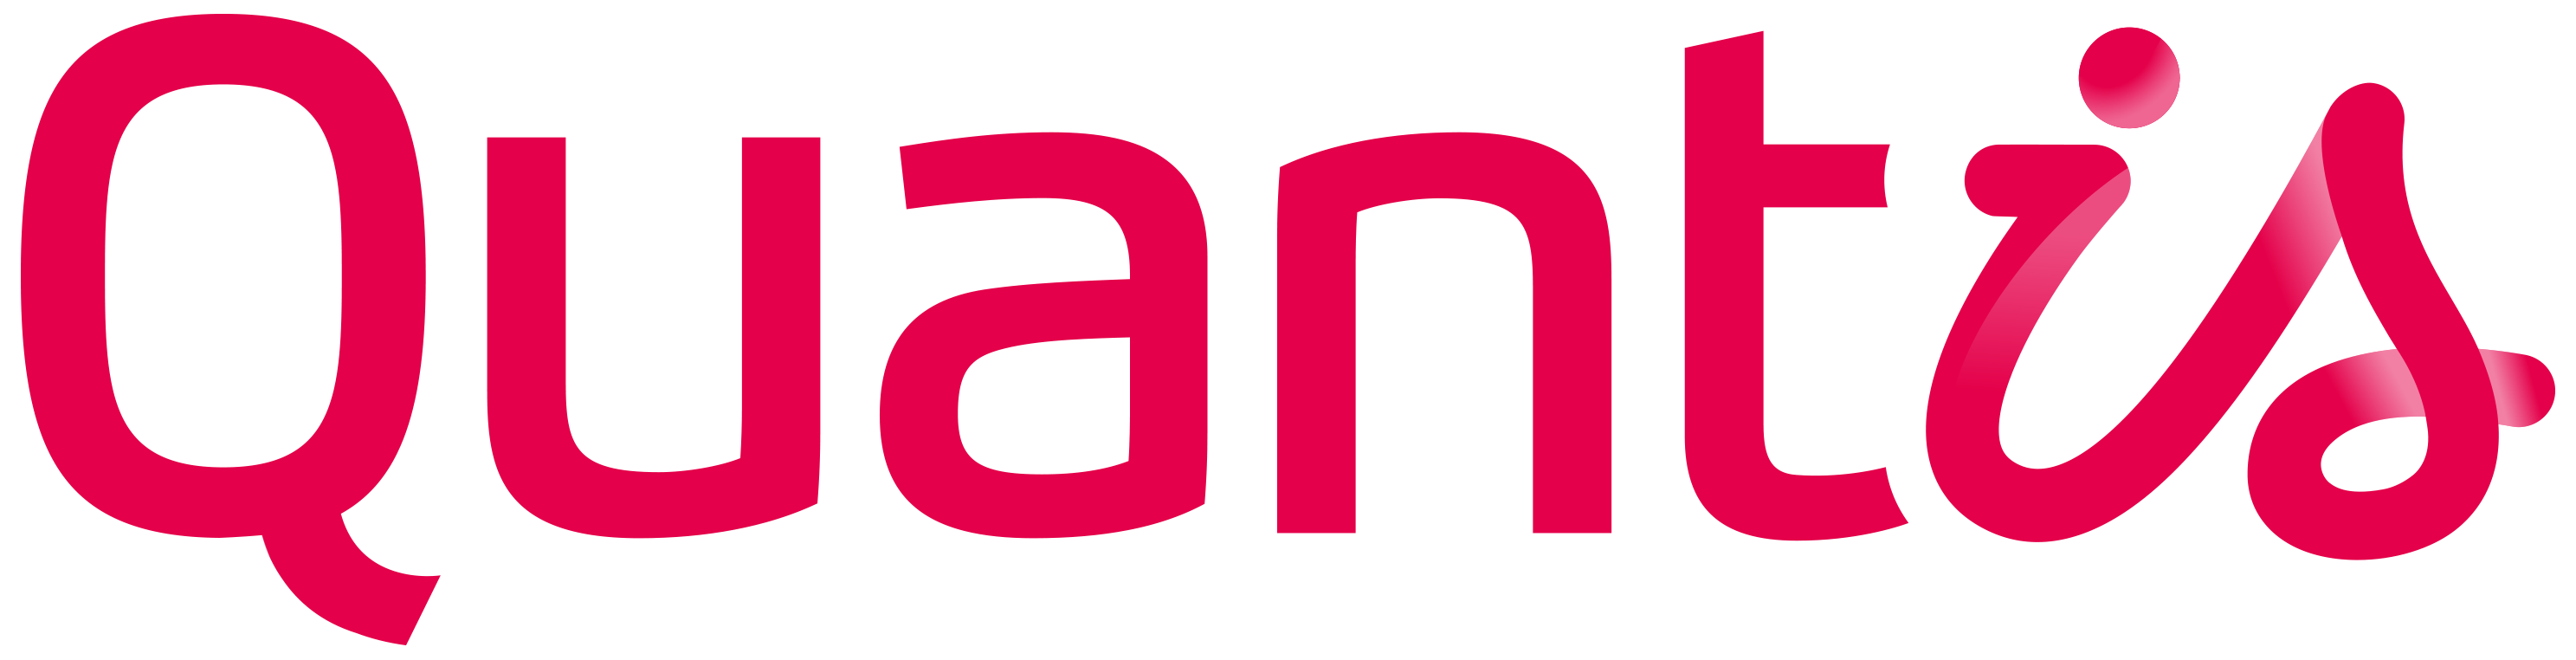 quantis_logo_red_rgb_transparent_backgro